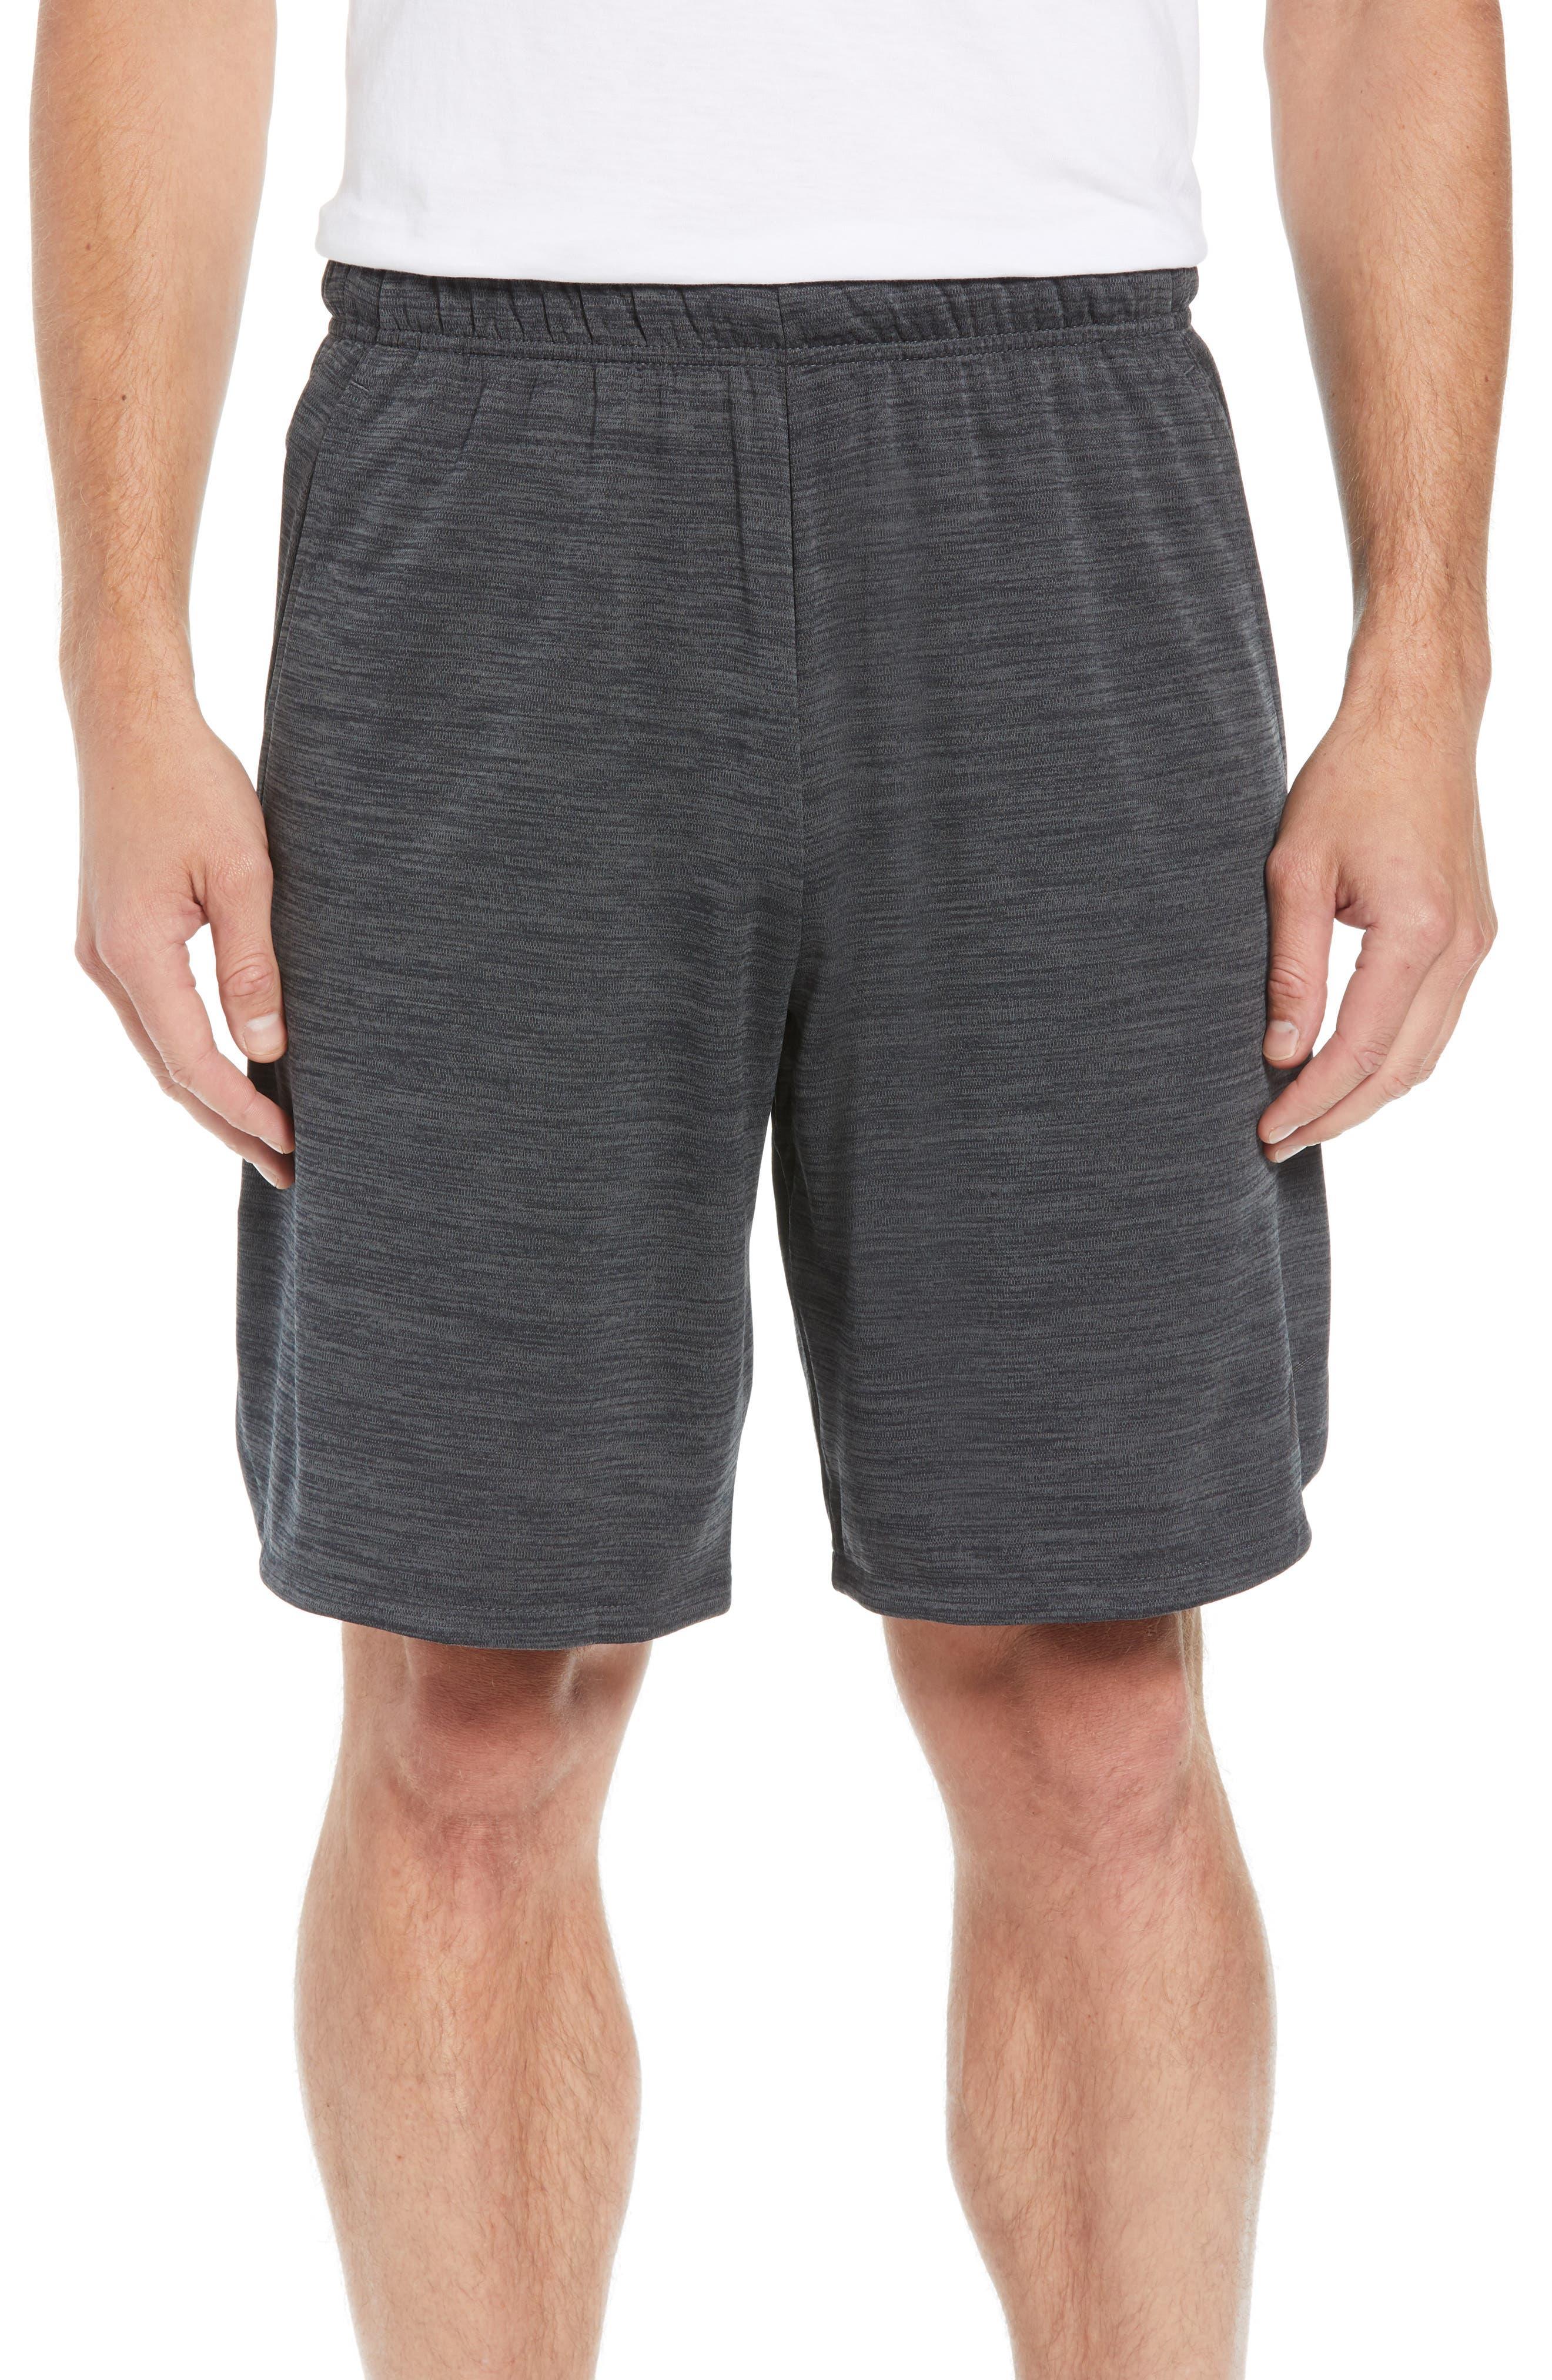 Dry Training Shorts,                             Main thumbnail 1, color,                             BLACK